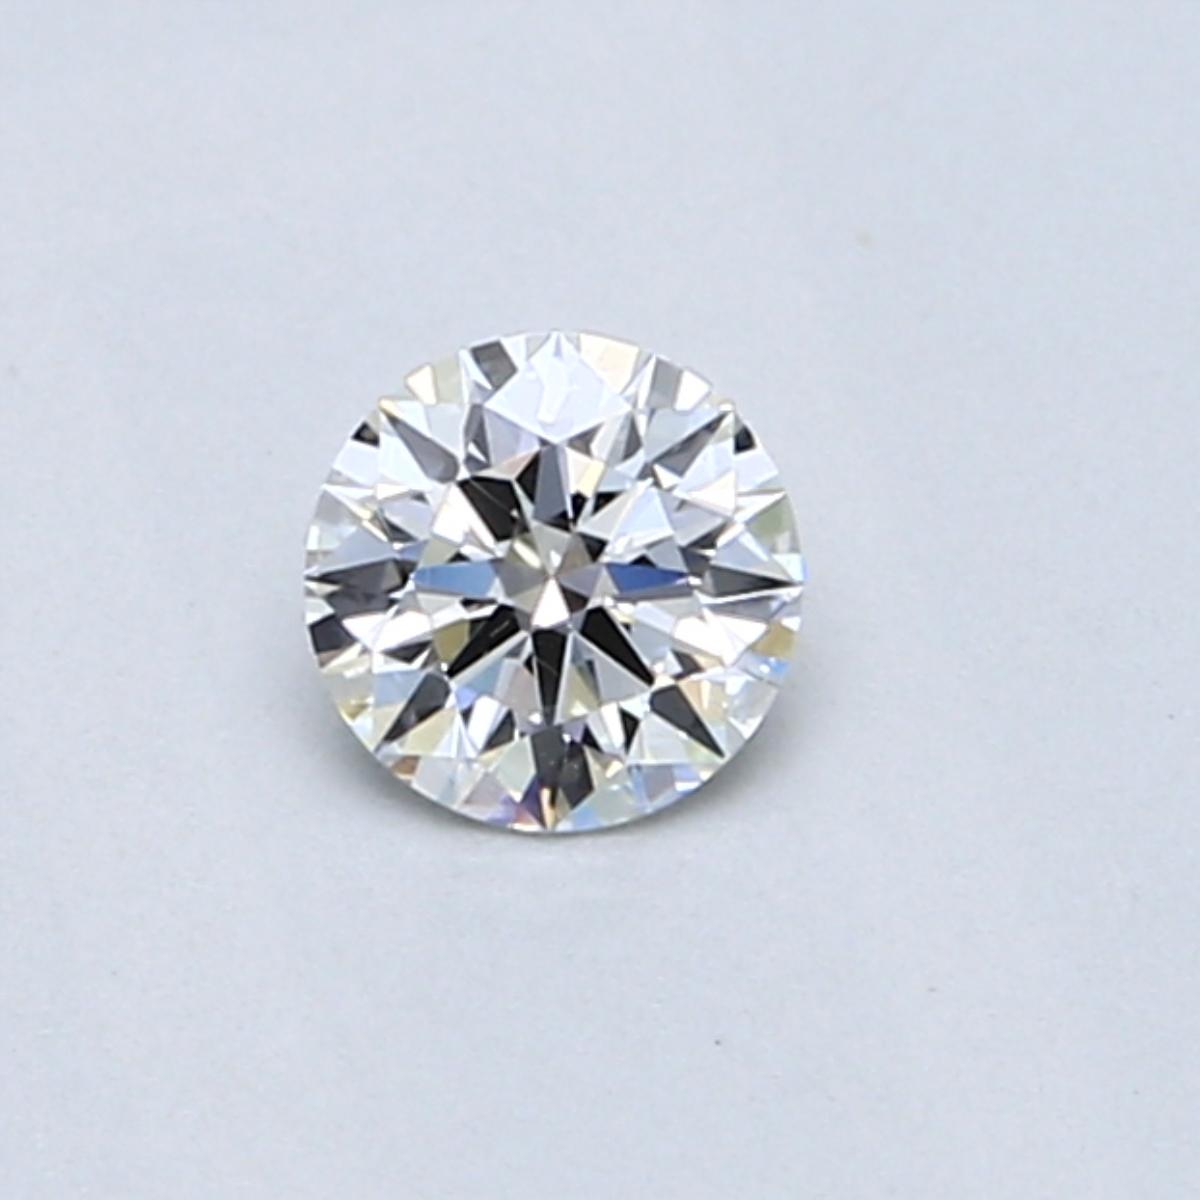 0.31 Carat E SI1 Round Diamond